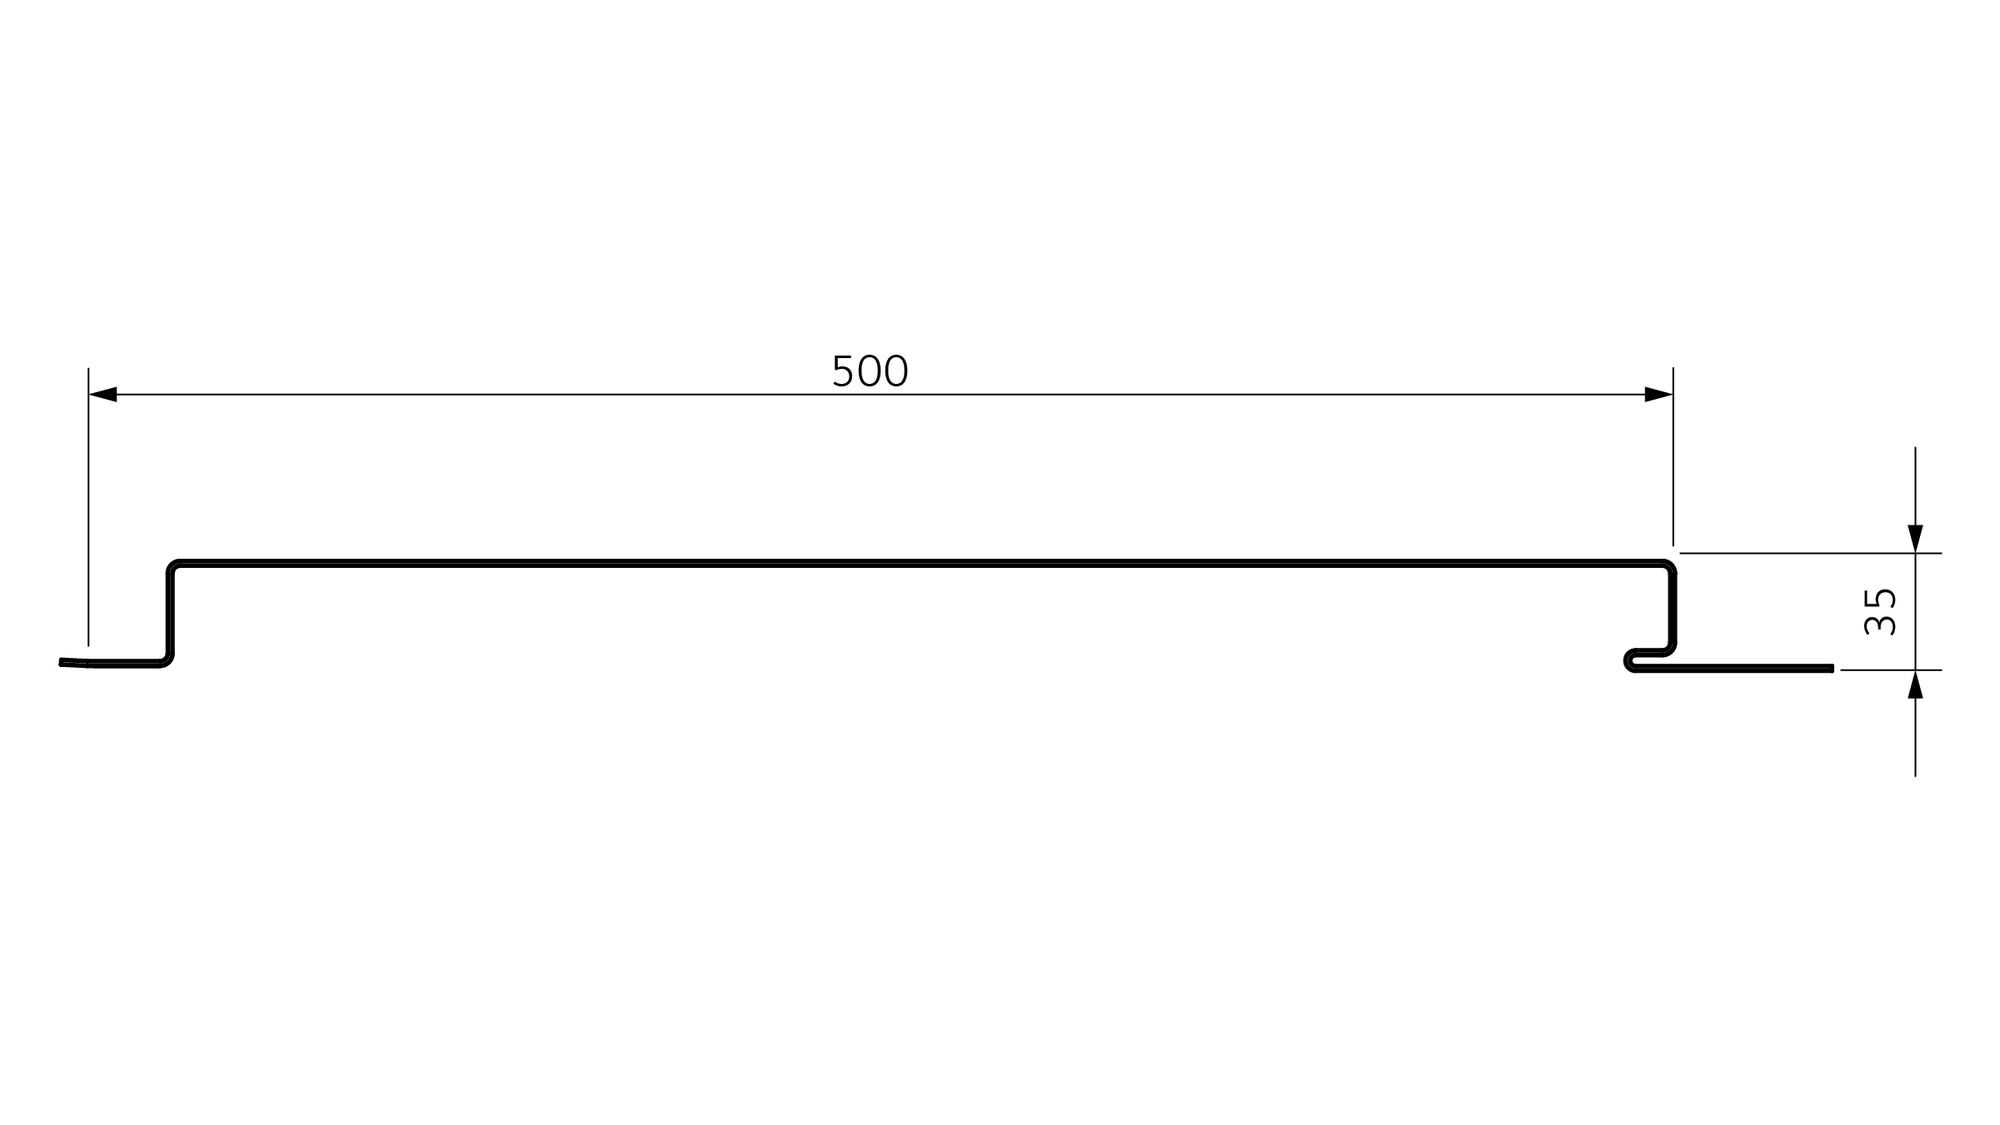 ST500 type JCD